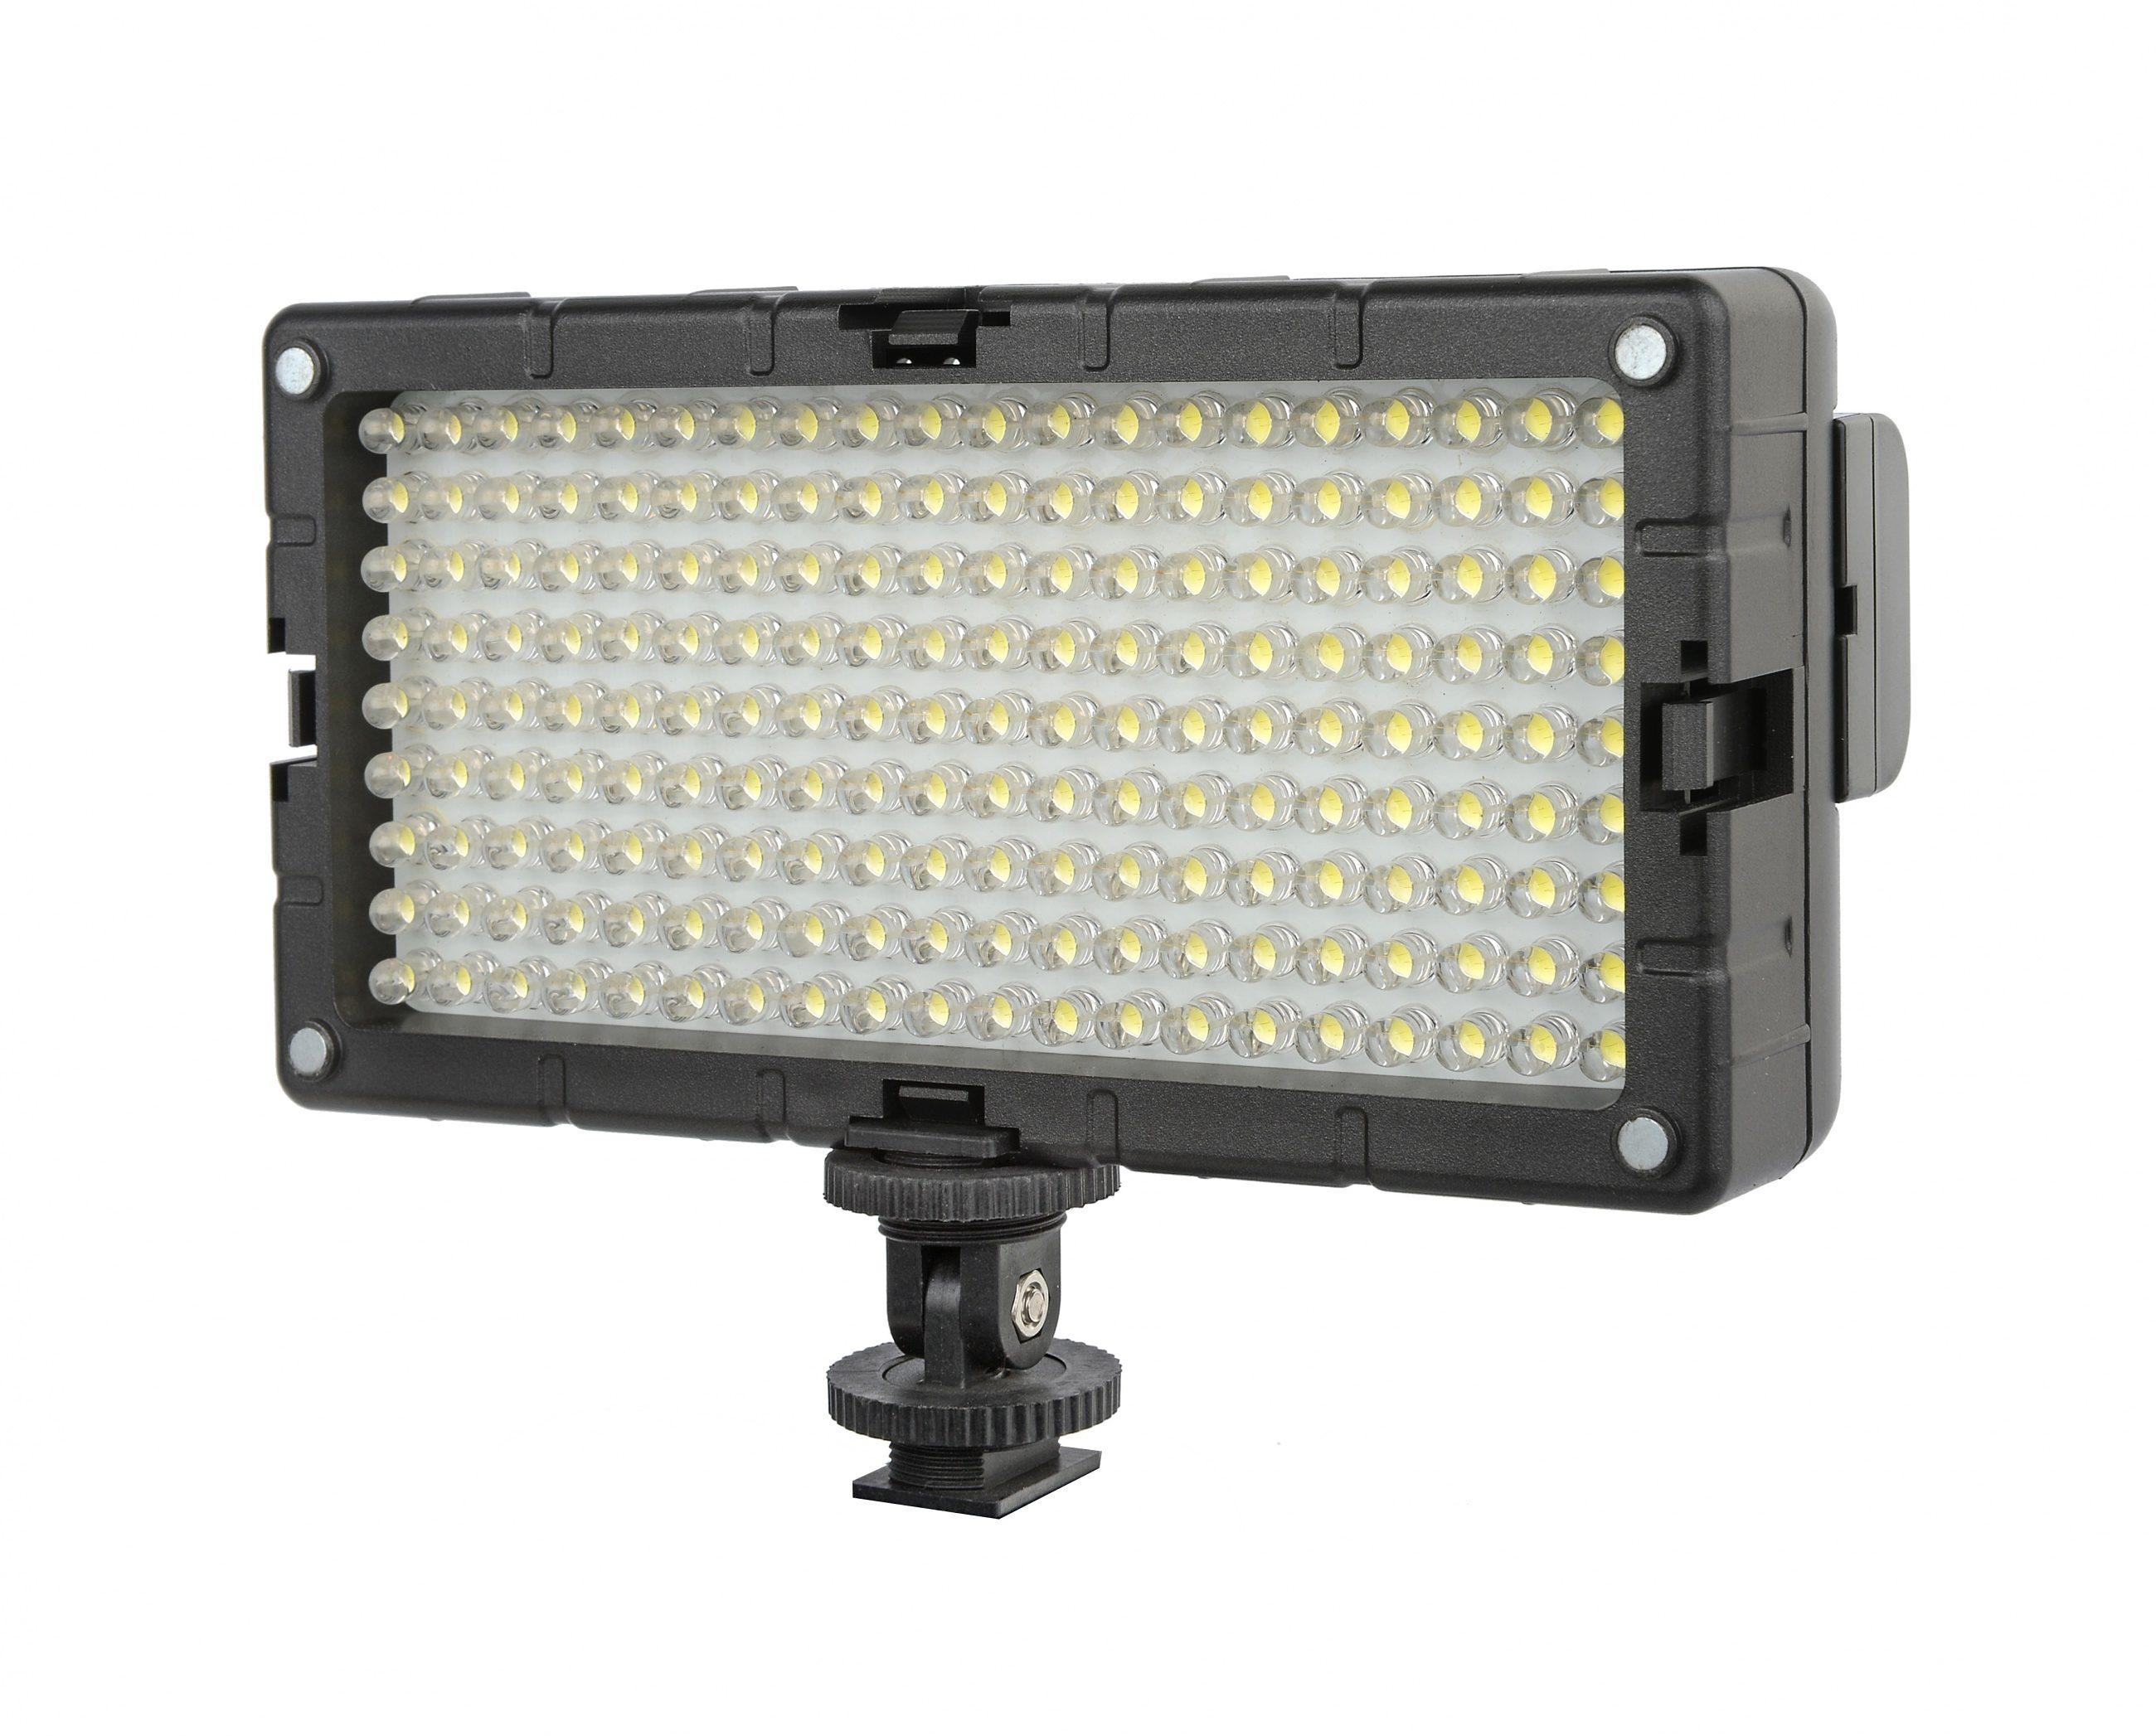 BRESSER Fotostudio »BRESSER S-7 LED-Beleuchtung 11W-175W + 2 Akkus«